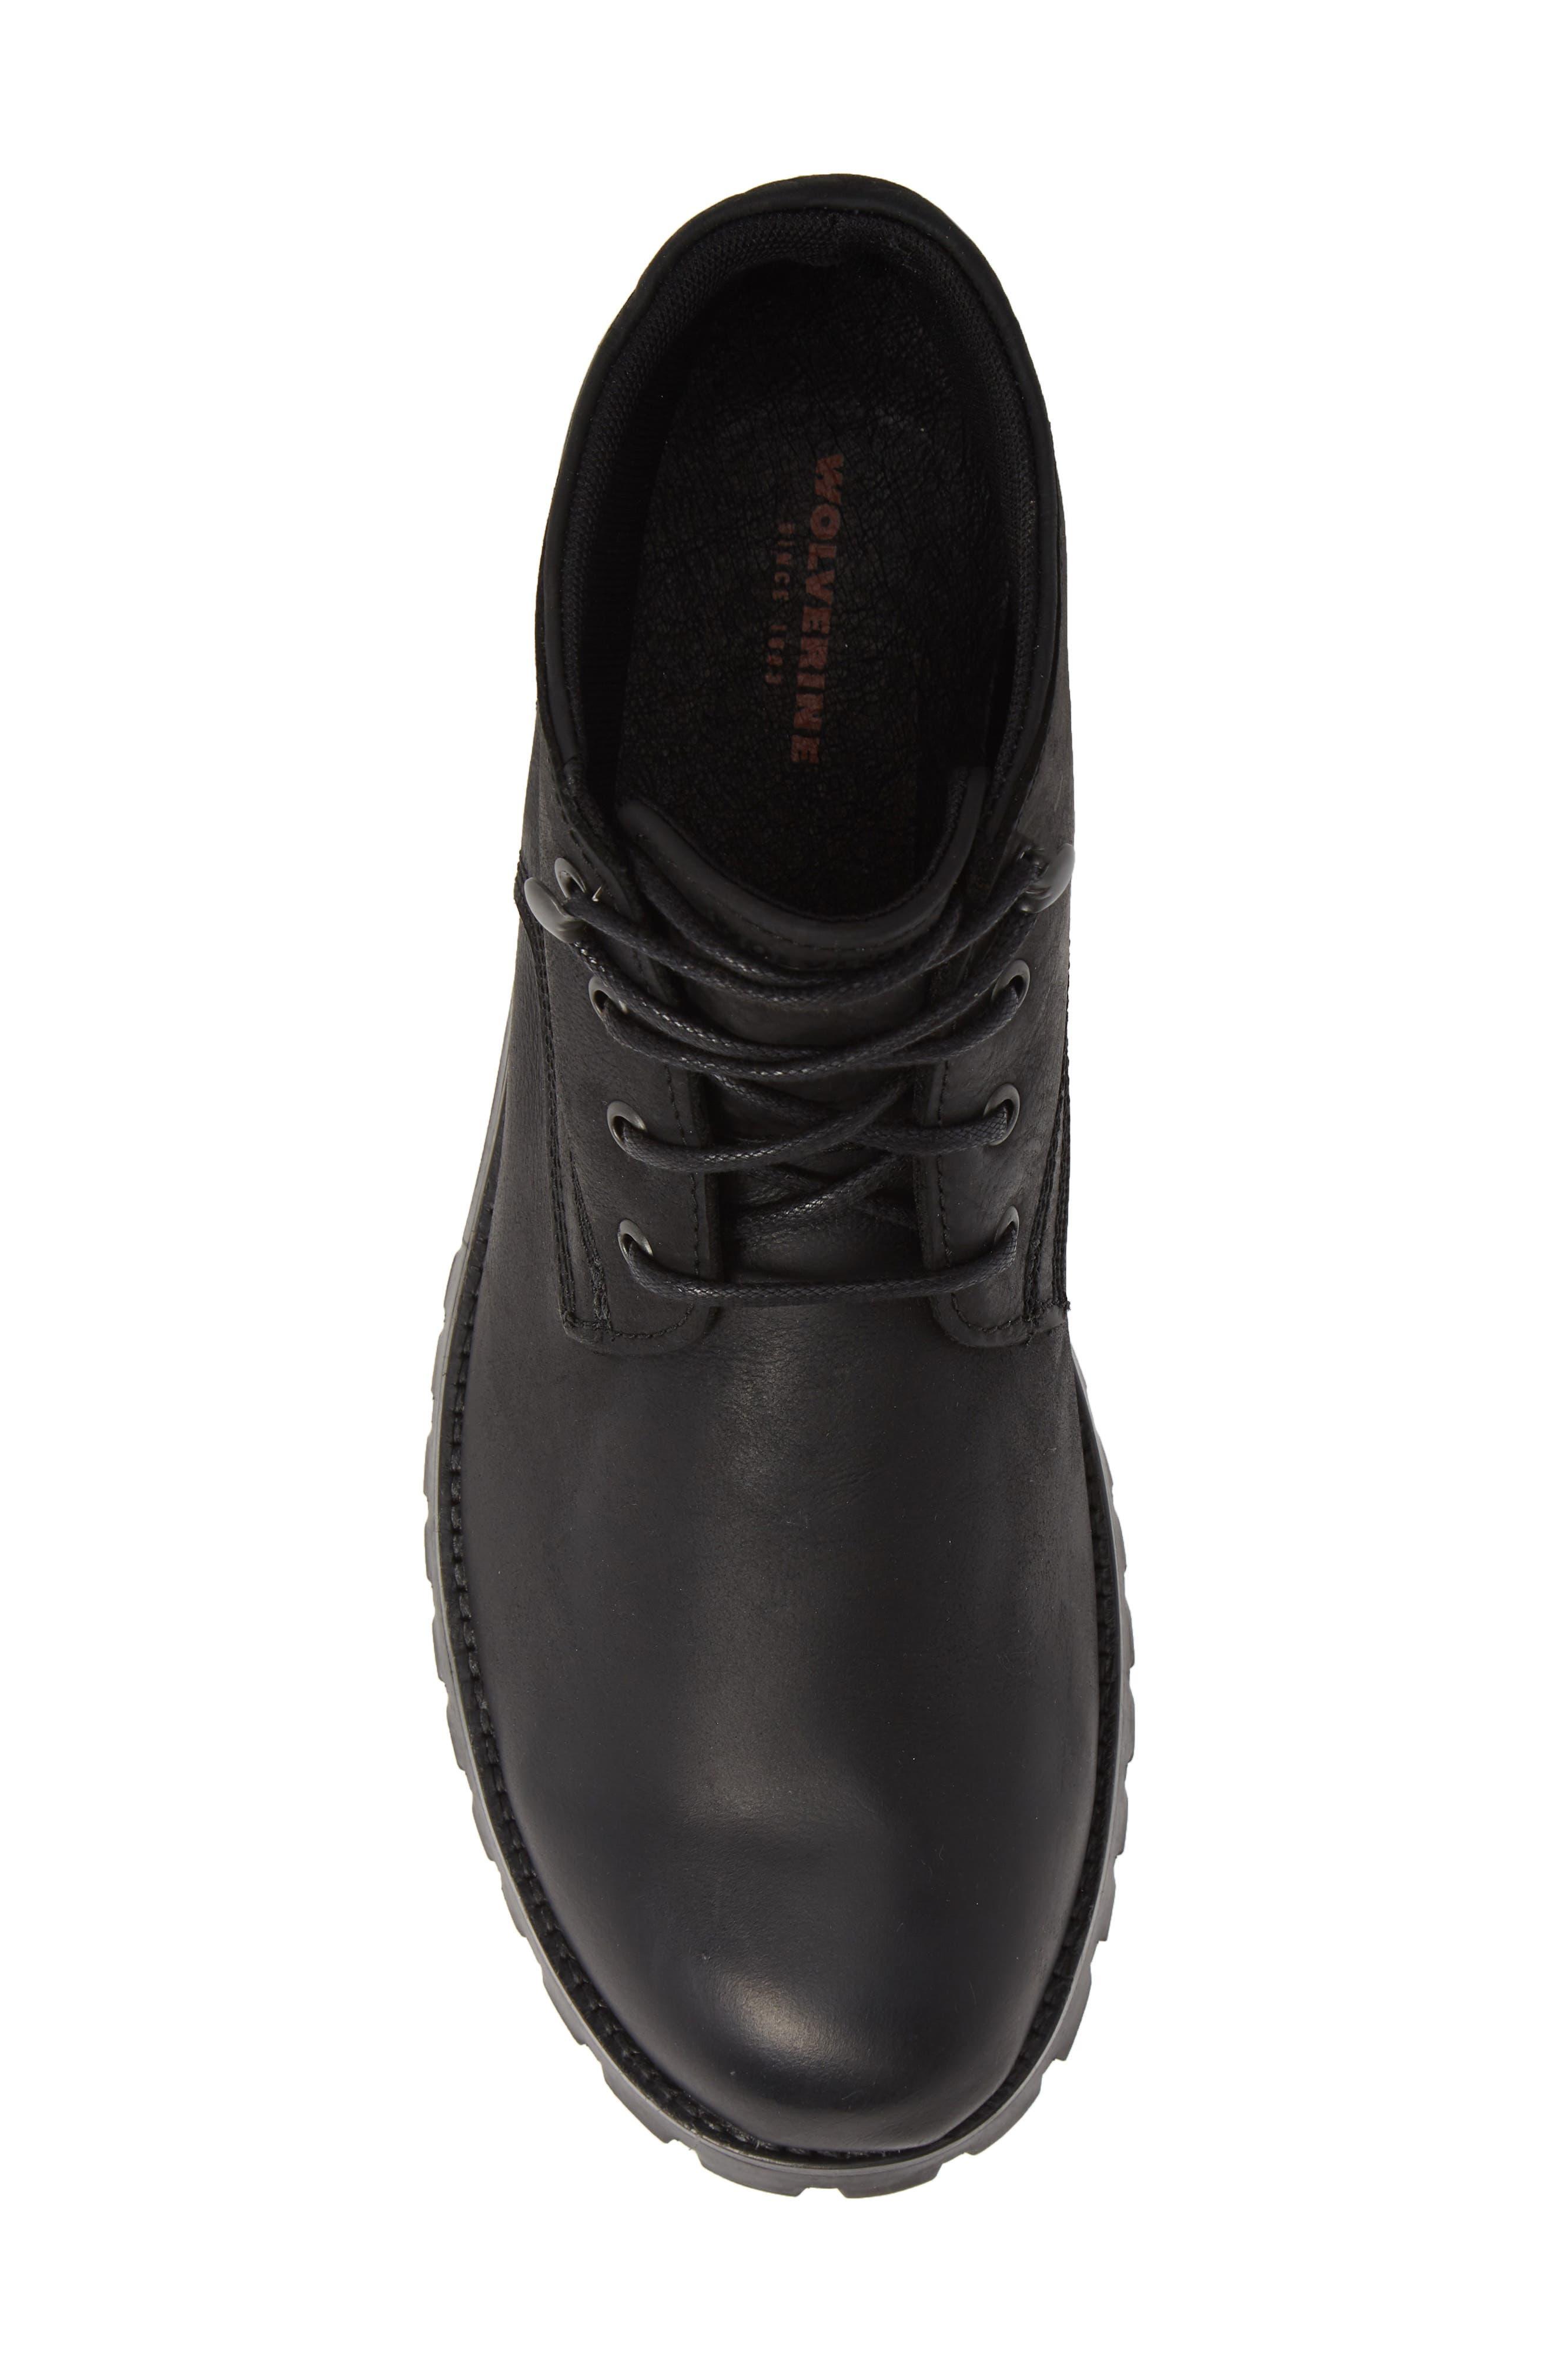 WOLVERINE,                             Cort Plain Toe Waterproof Boot,                             Alternate thumbnail 5, color,                             MEDIUM BLACK